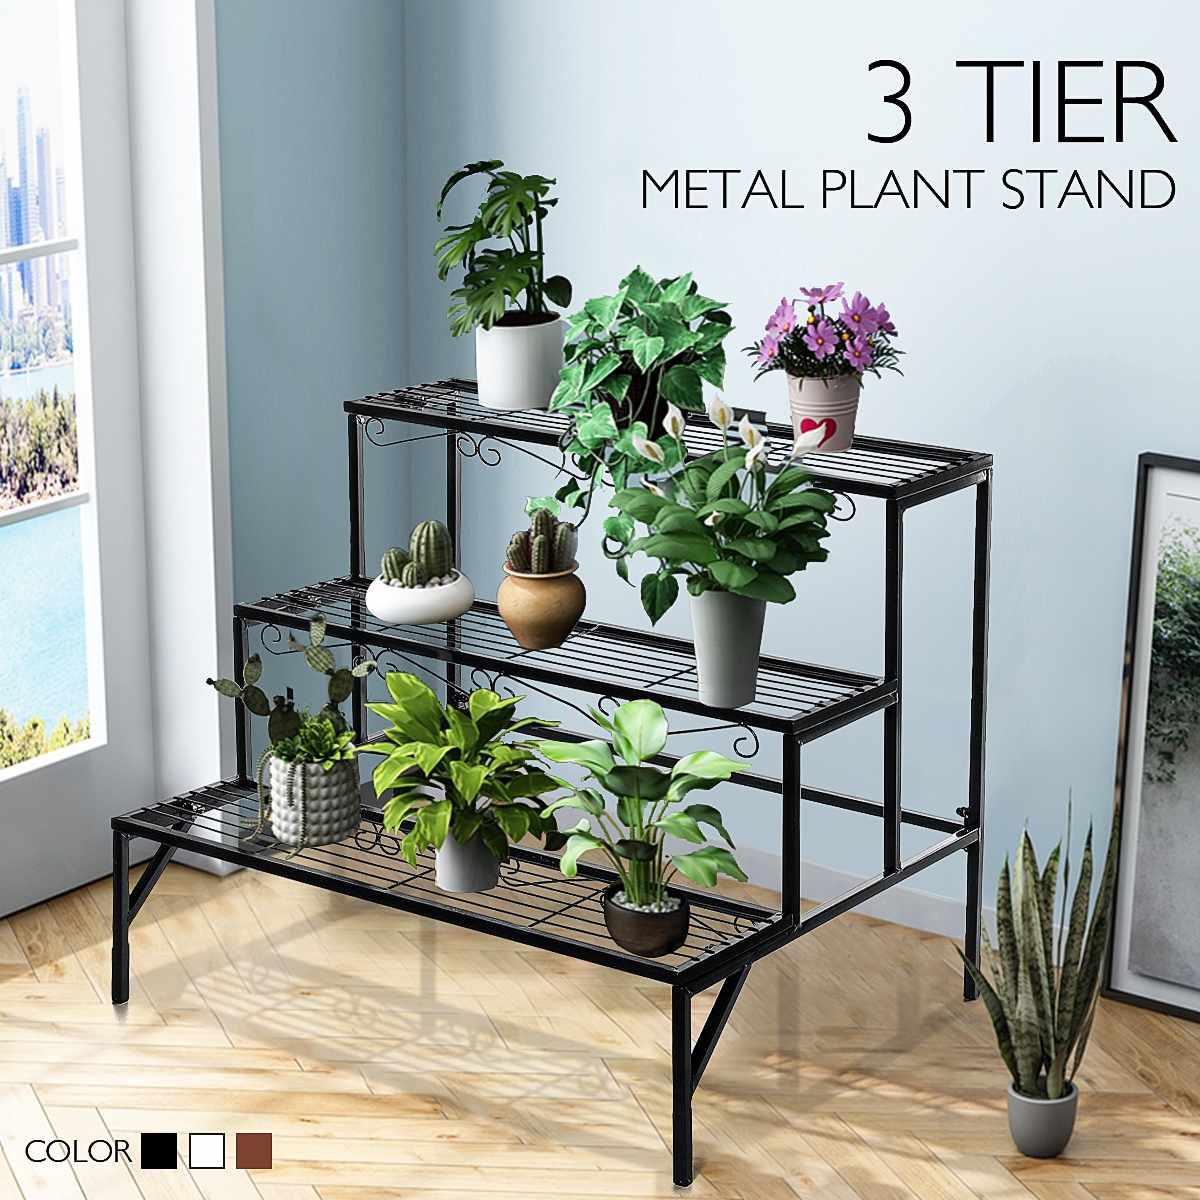 Multi-tiers Flower Plant Holder Stand Rack Plant Stand Balcony Garden Flower Stand Bonsai Display Shelf Shelves